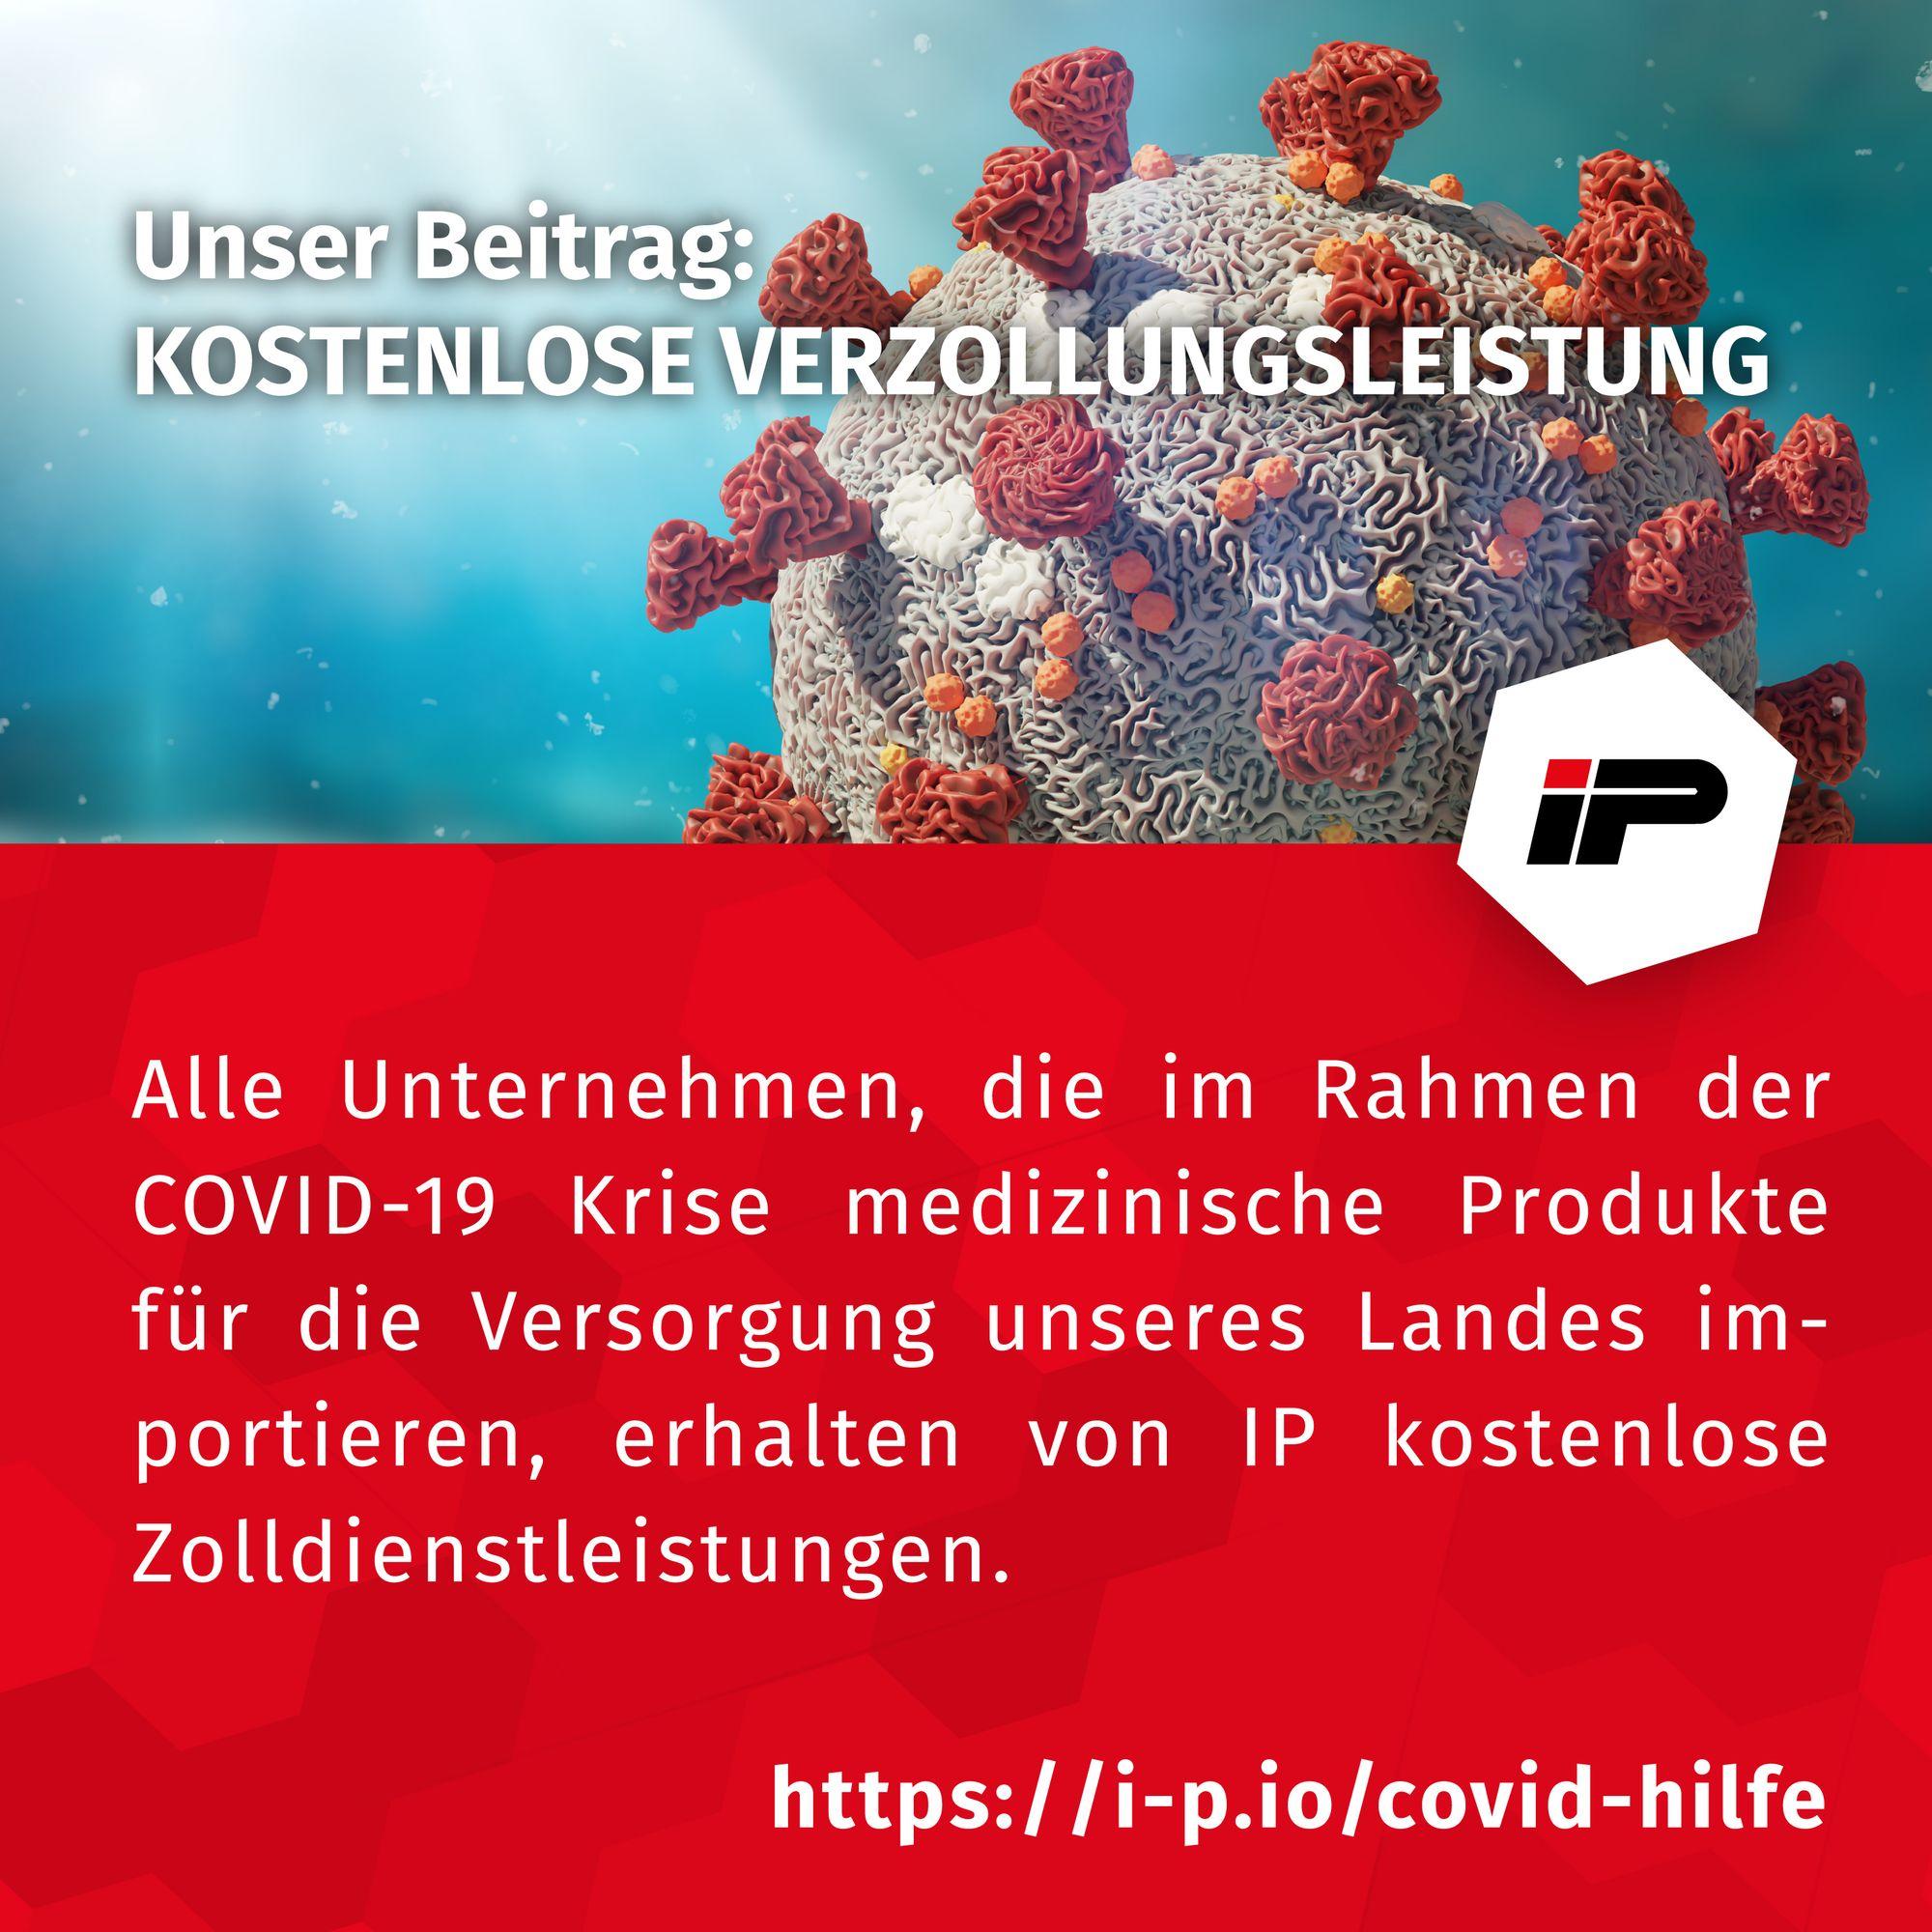 COVID-19 - kostenlose Zolldienst...